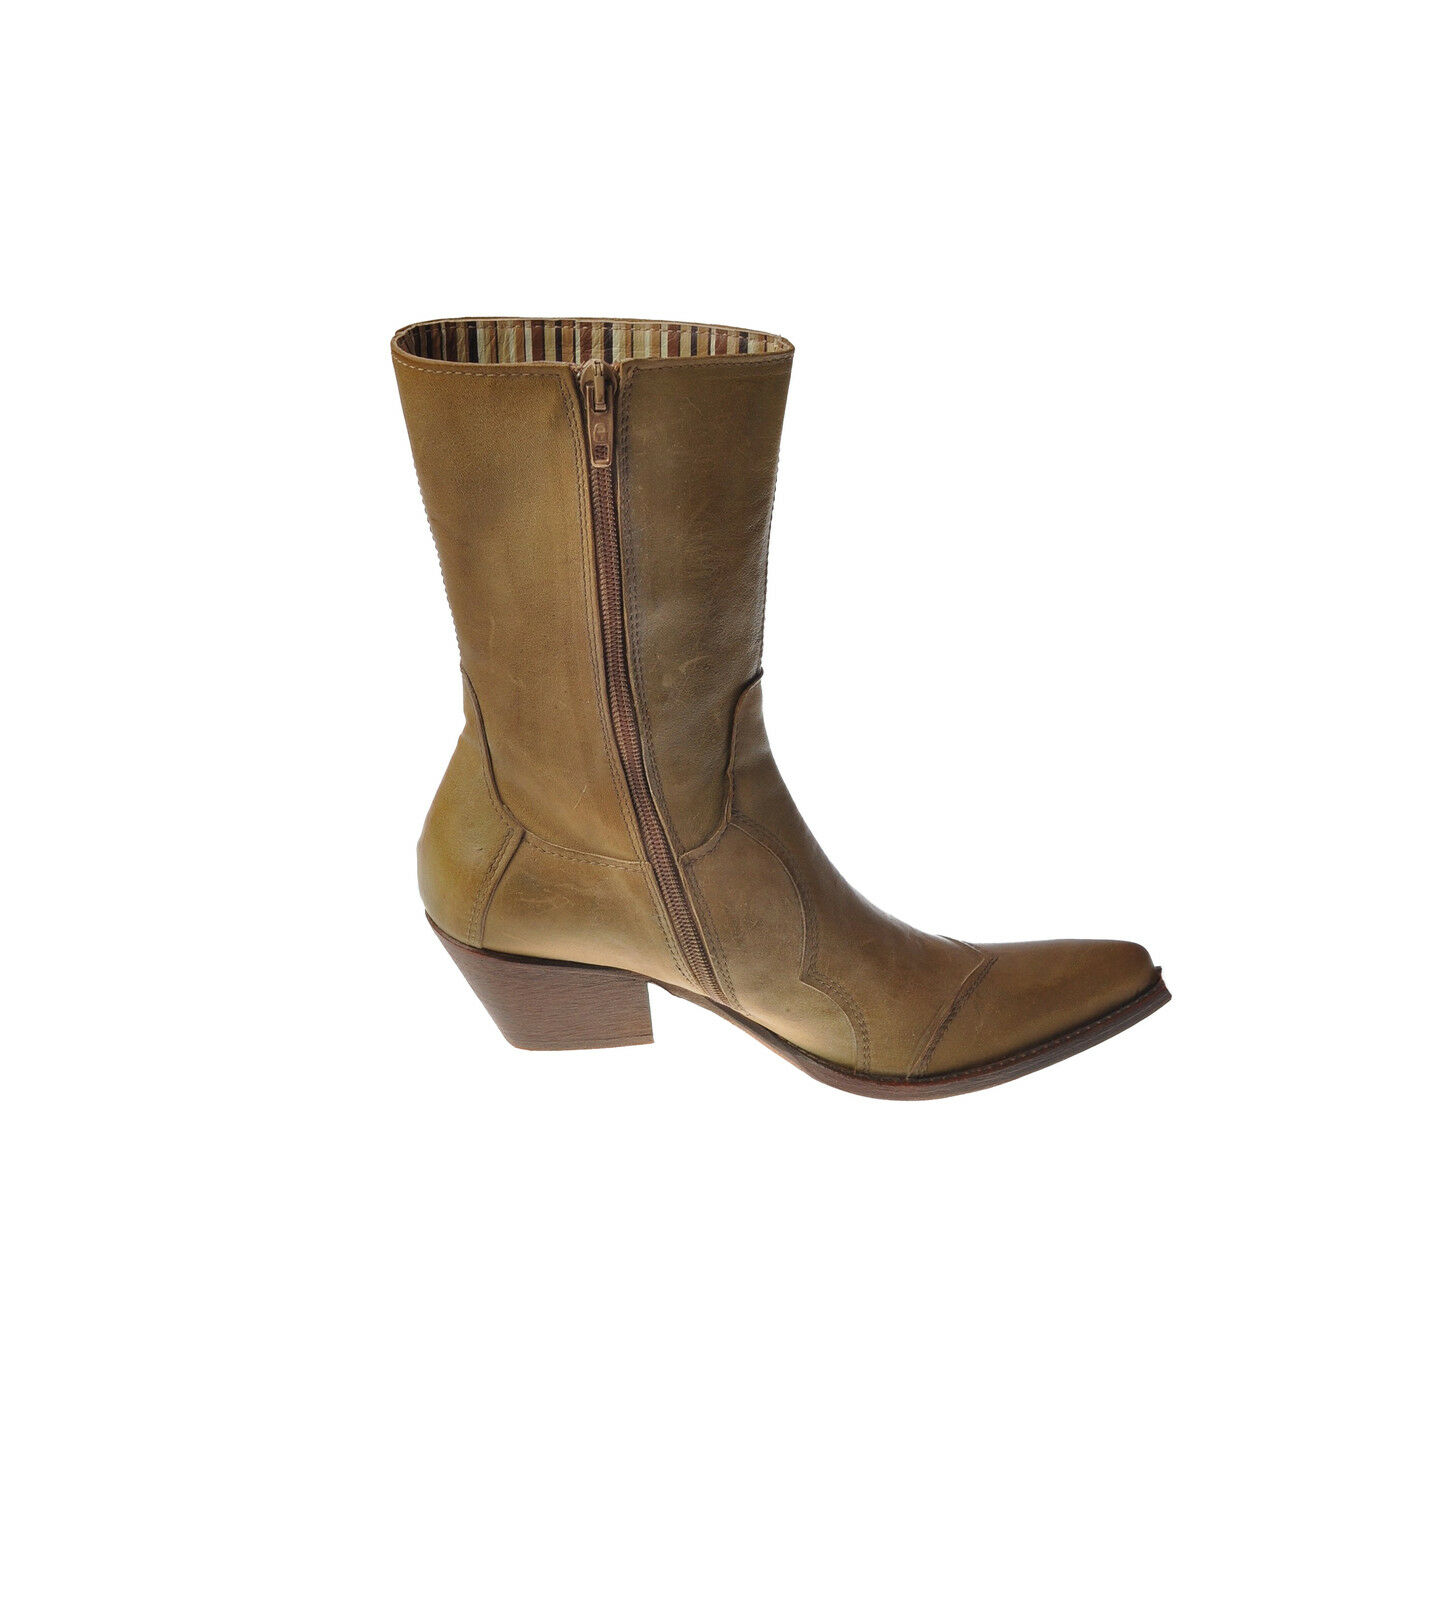 Moma - scarpe-stivali - Woman - verde - 3252328N185135